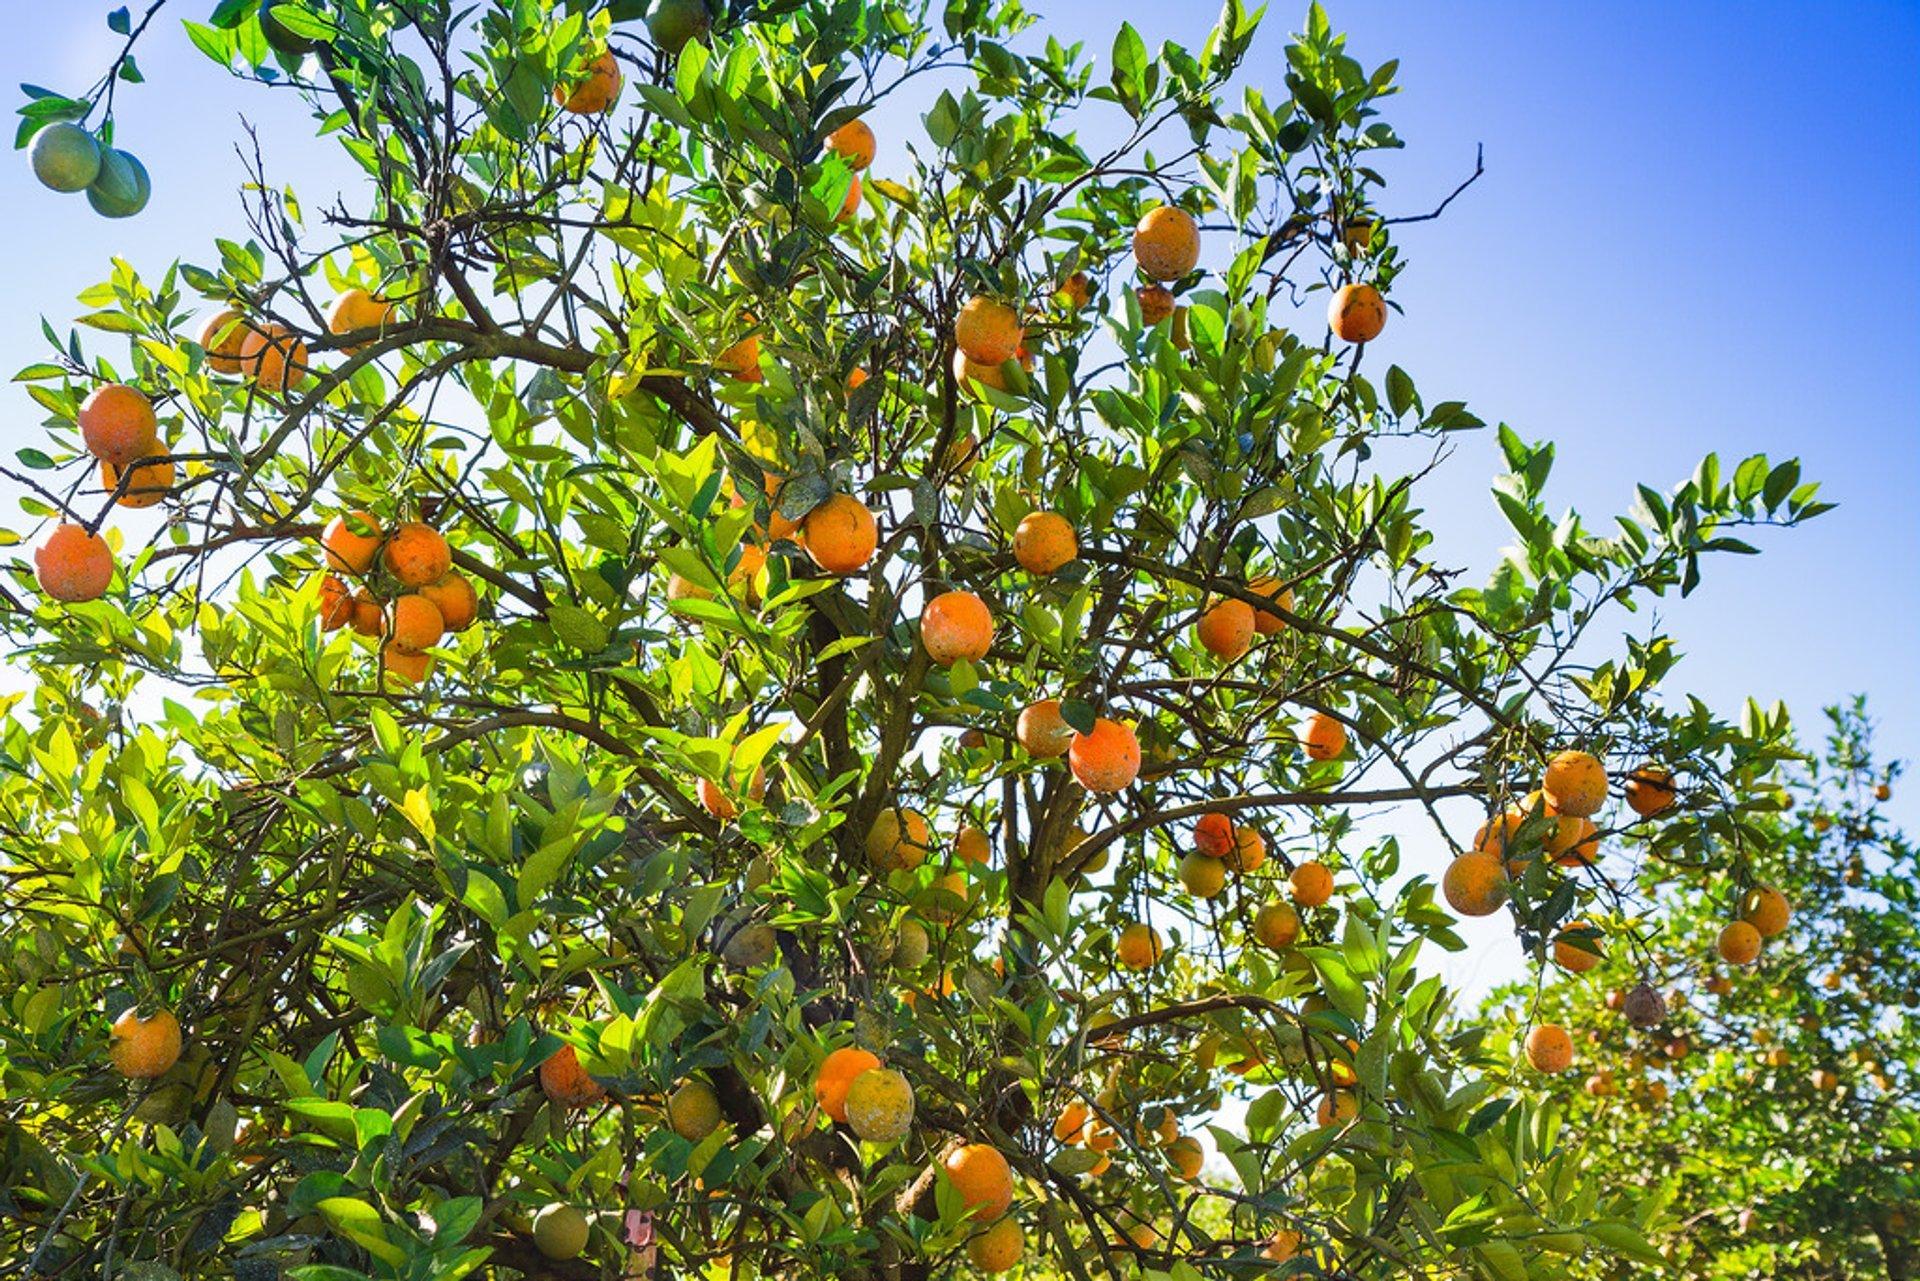 Citrus Season in Florida 2020 - Best Time